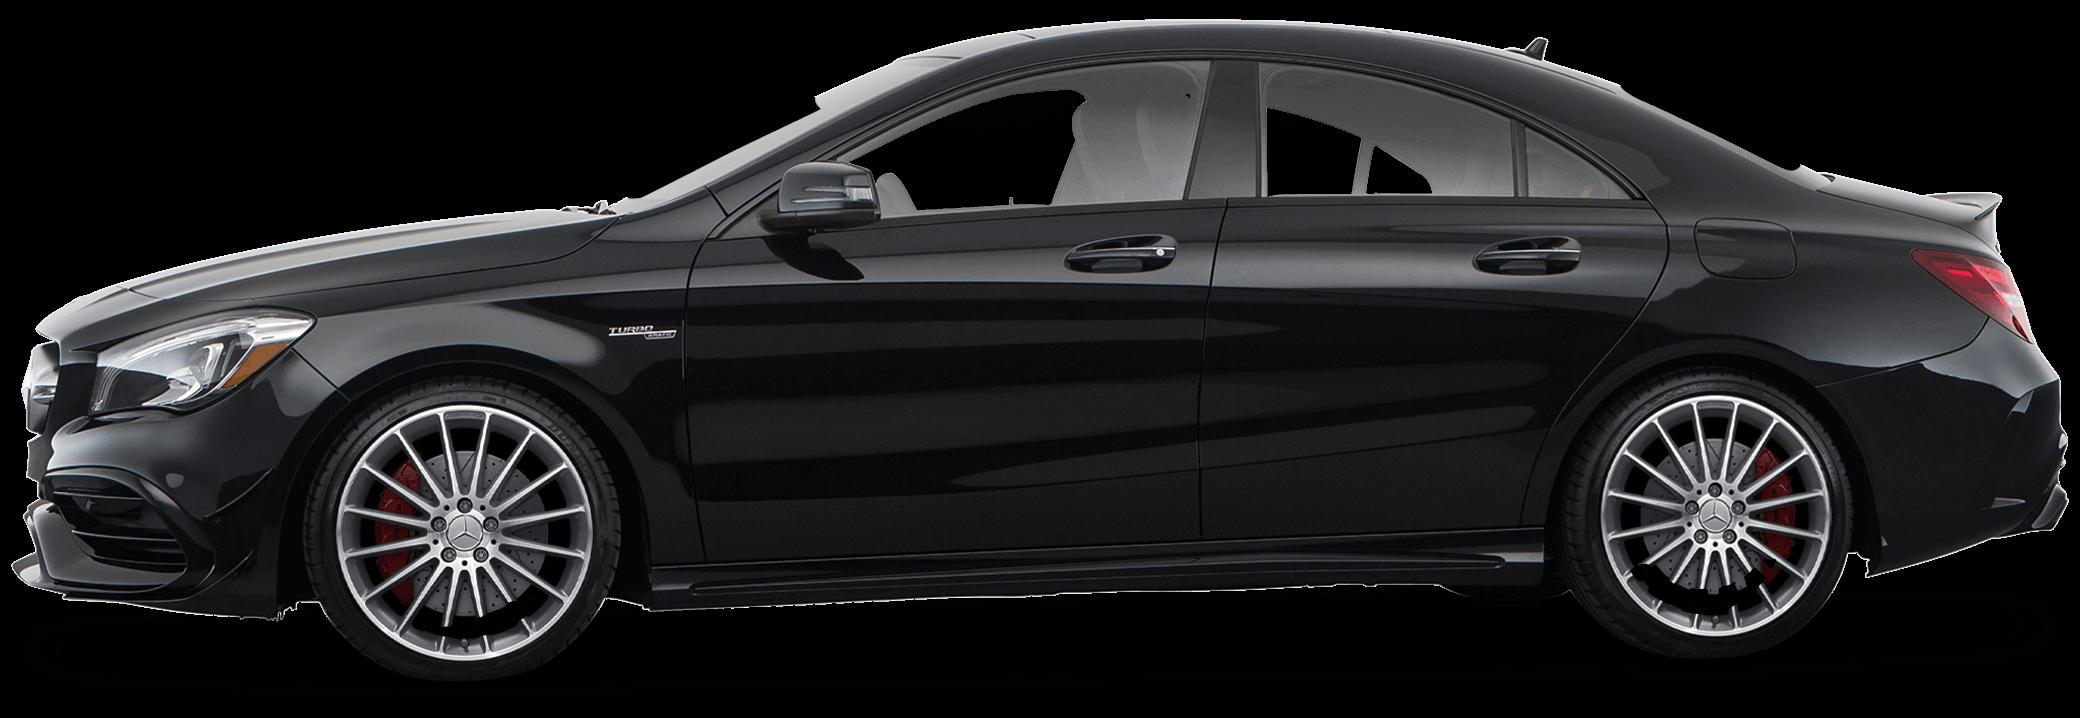 New Mercedes-Benz CLA for Sale at Mercedes-Benz of Calabasas